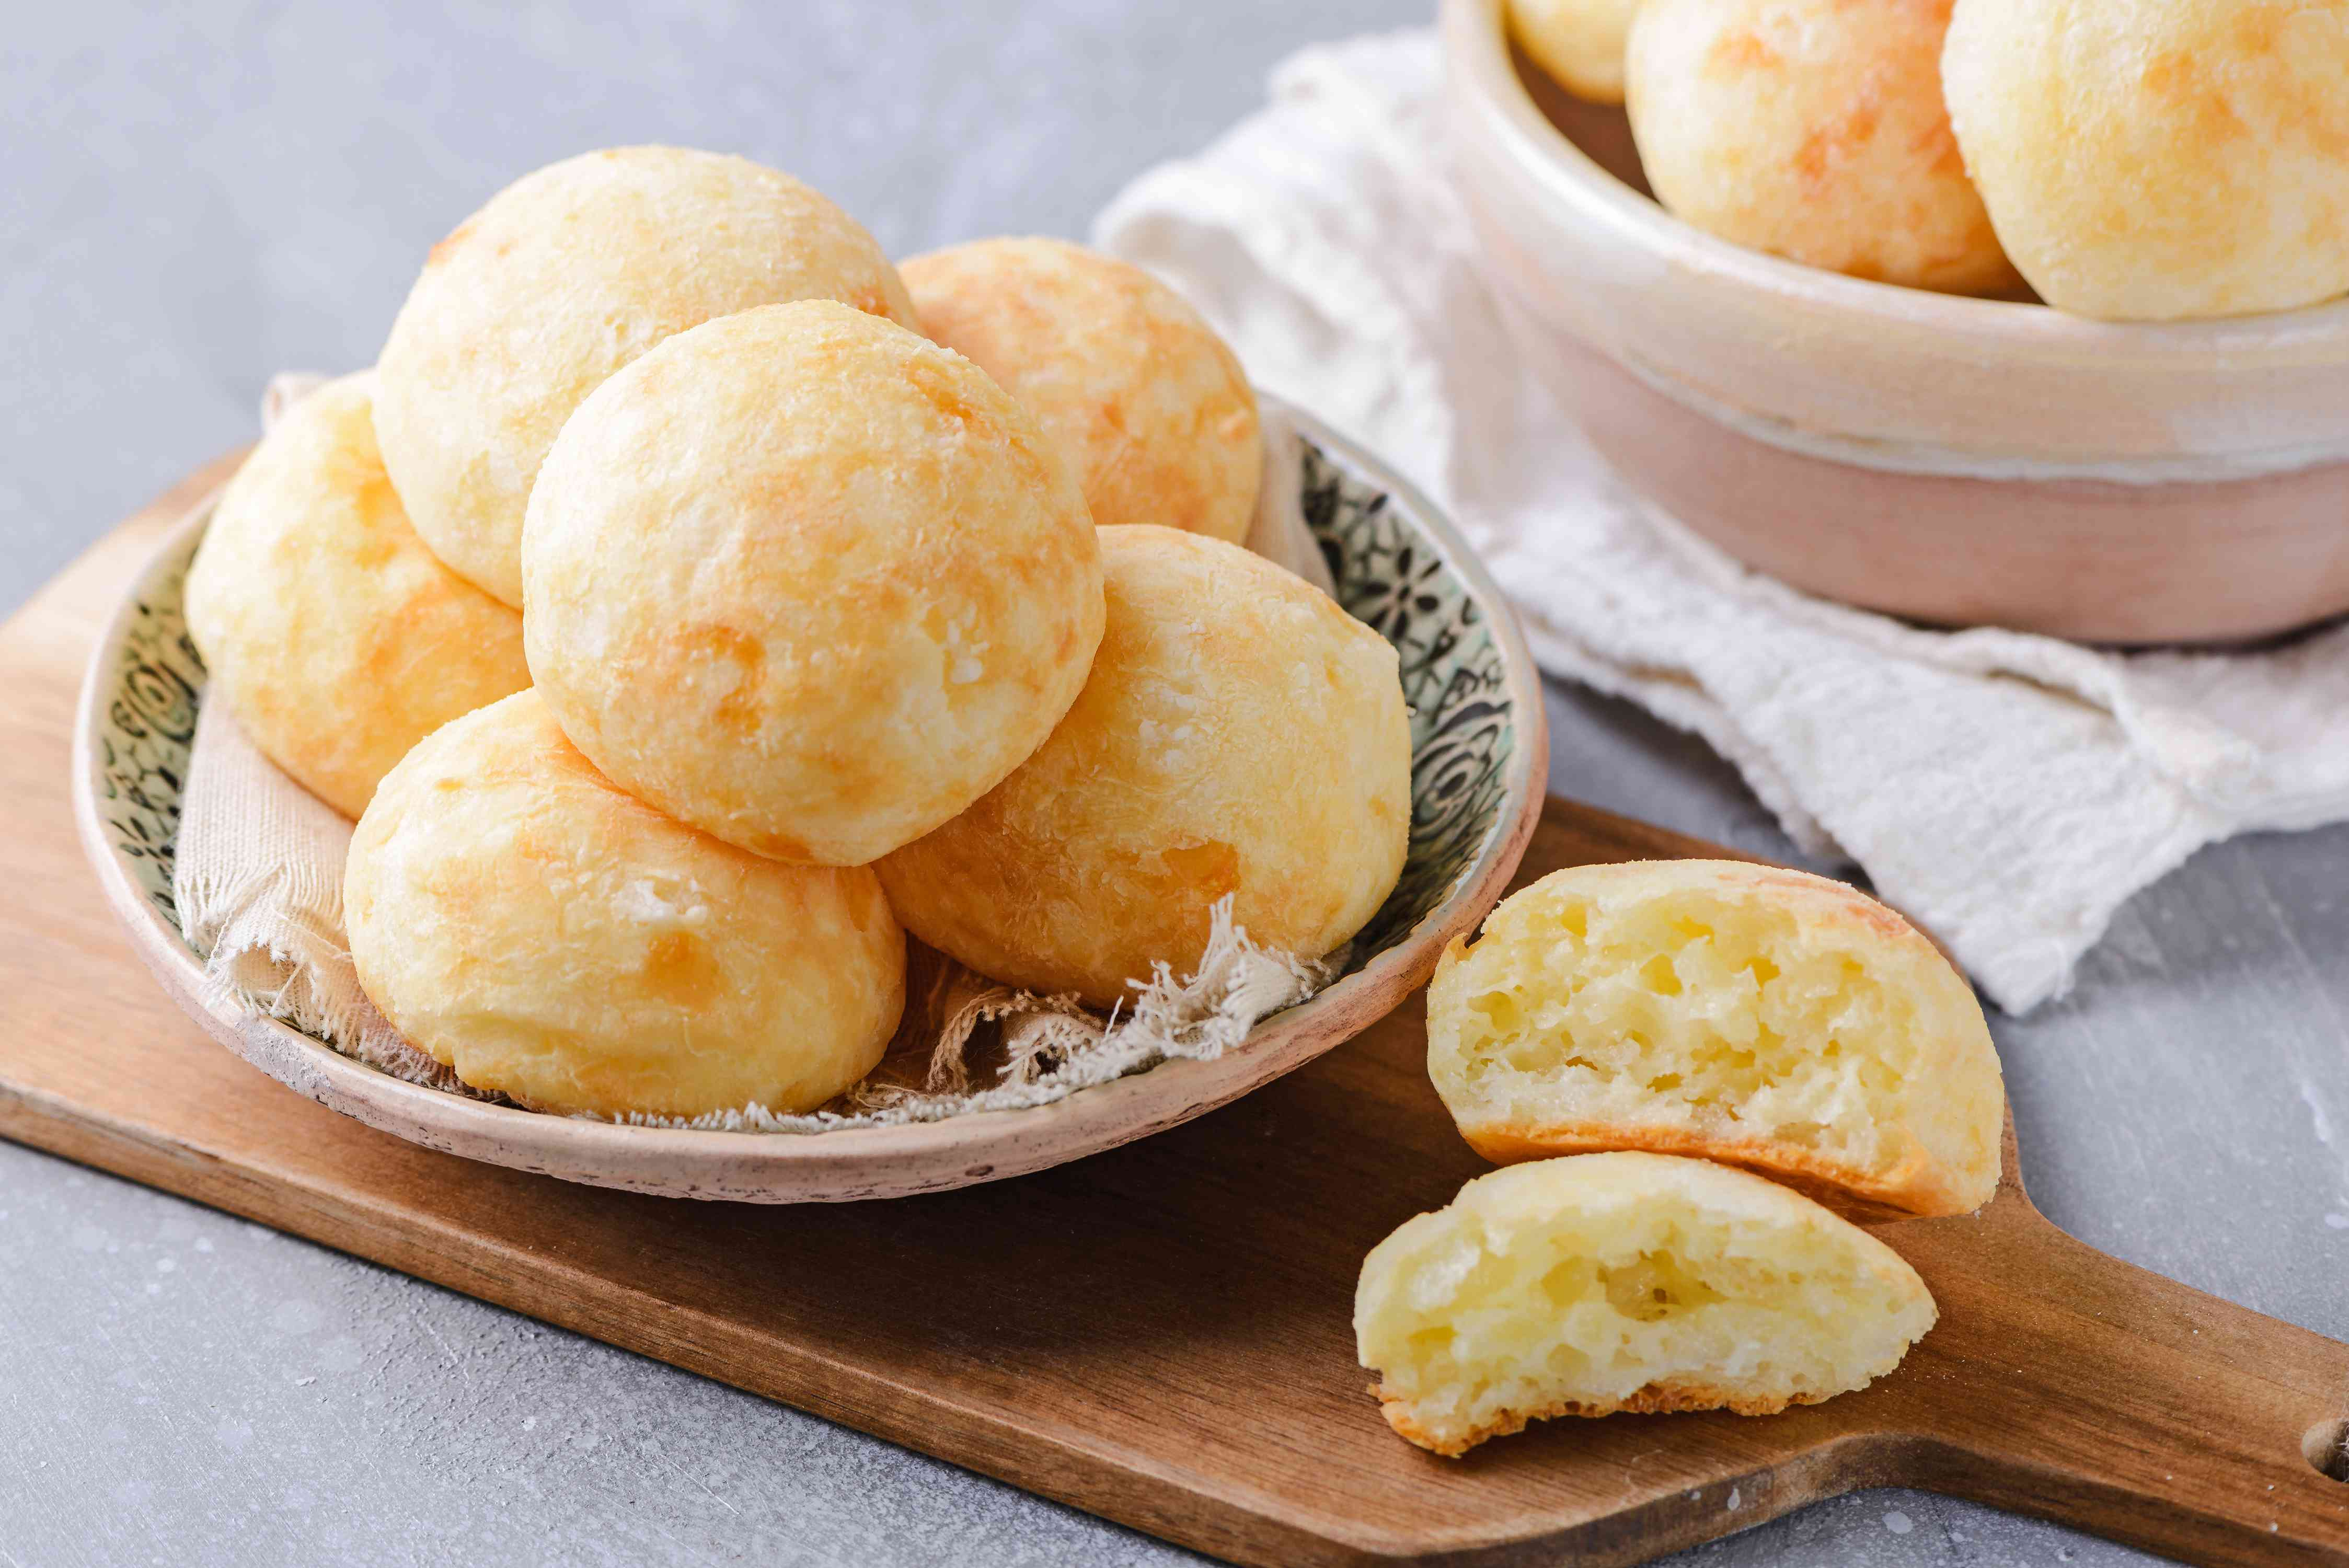 Pão de Queijo: Brazilian Cheese Bread Recipe